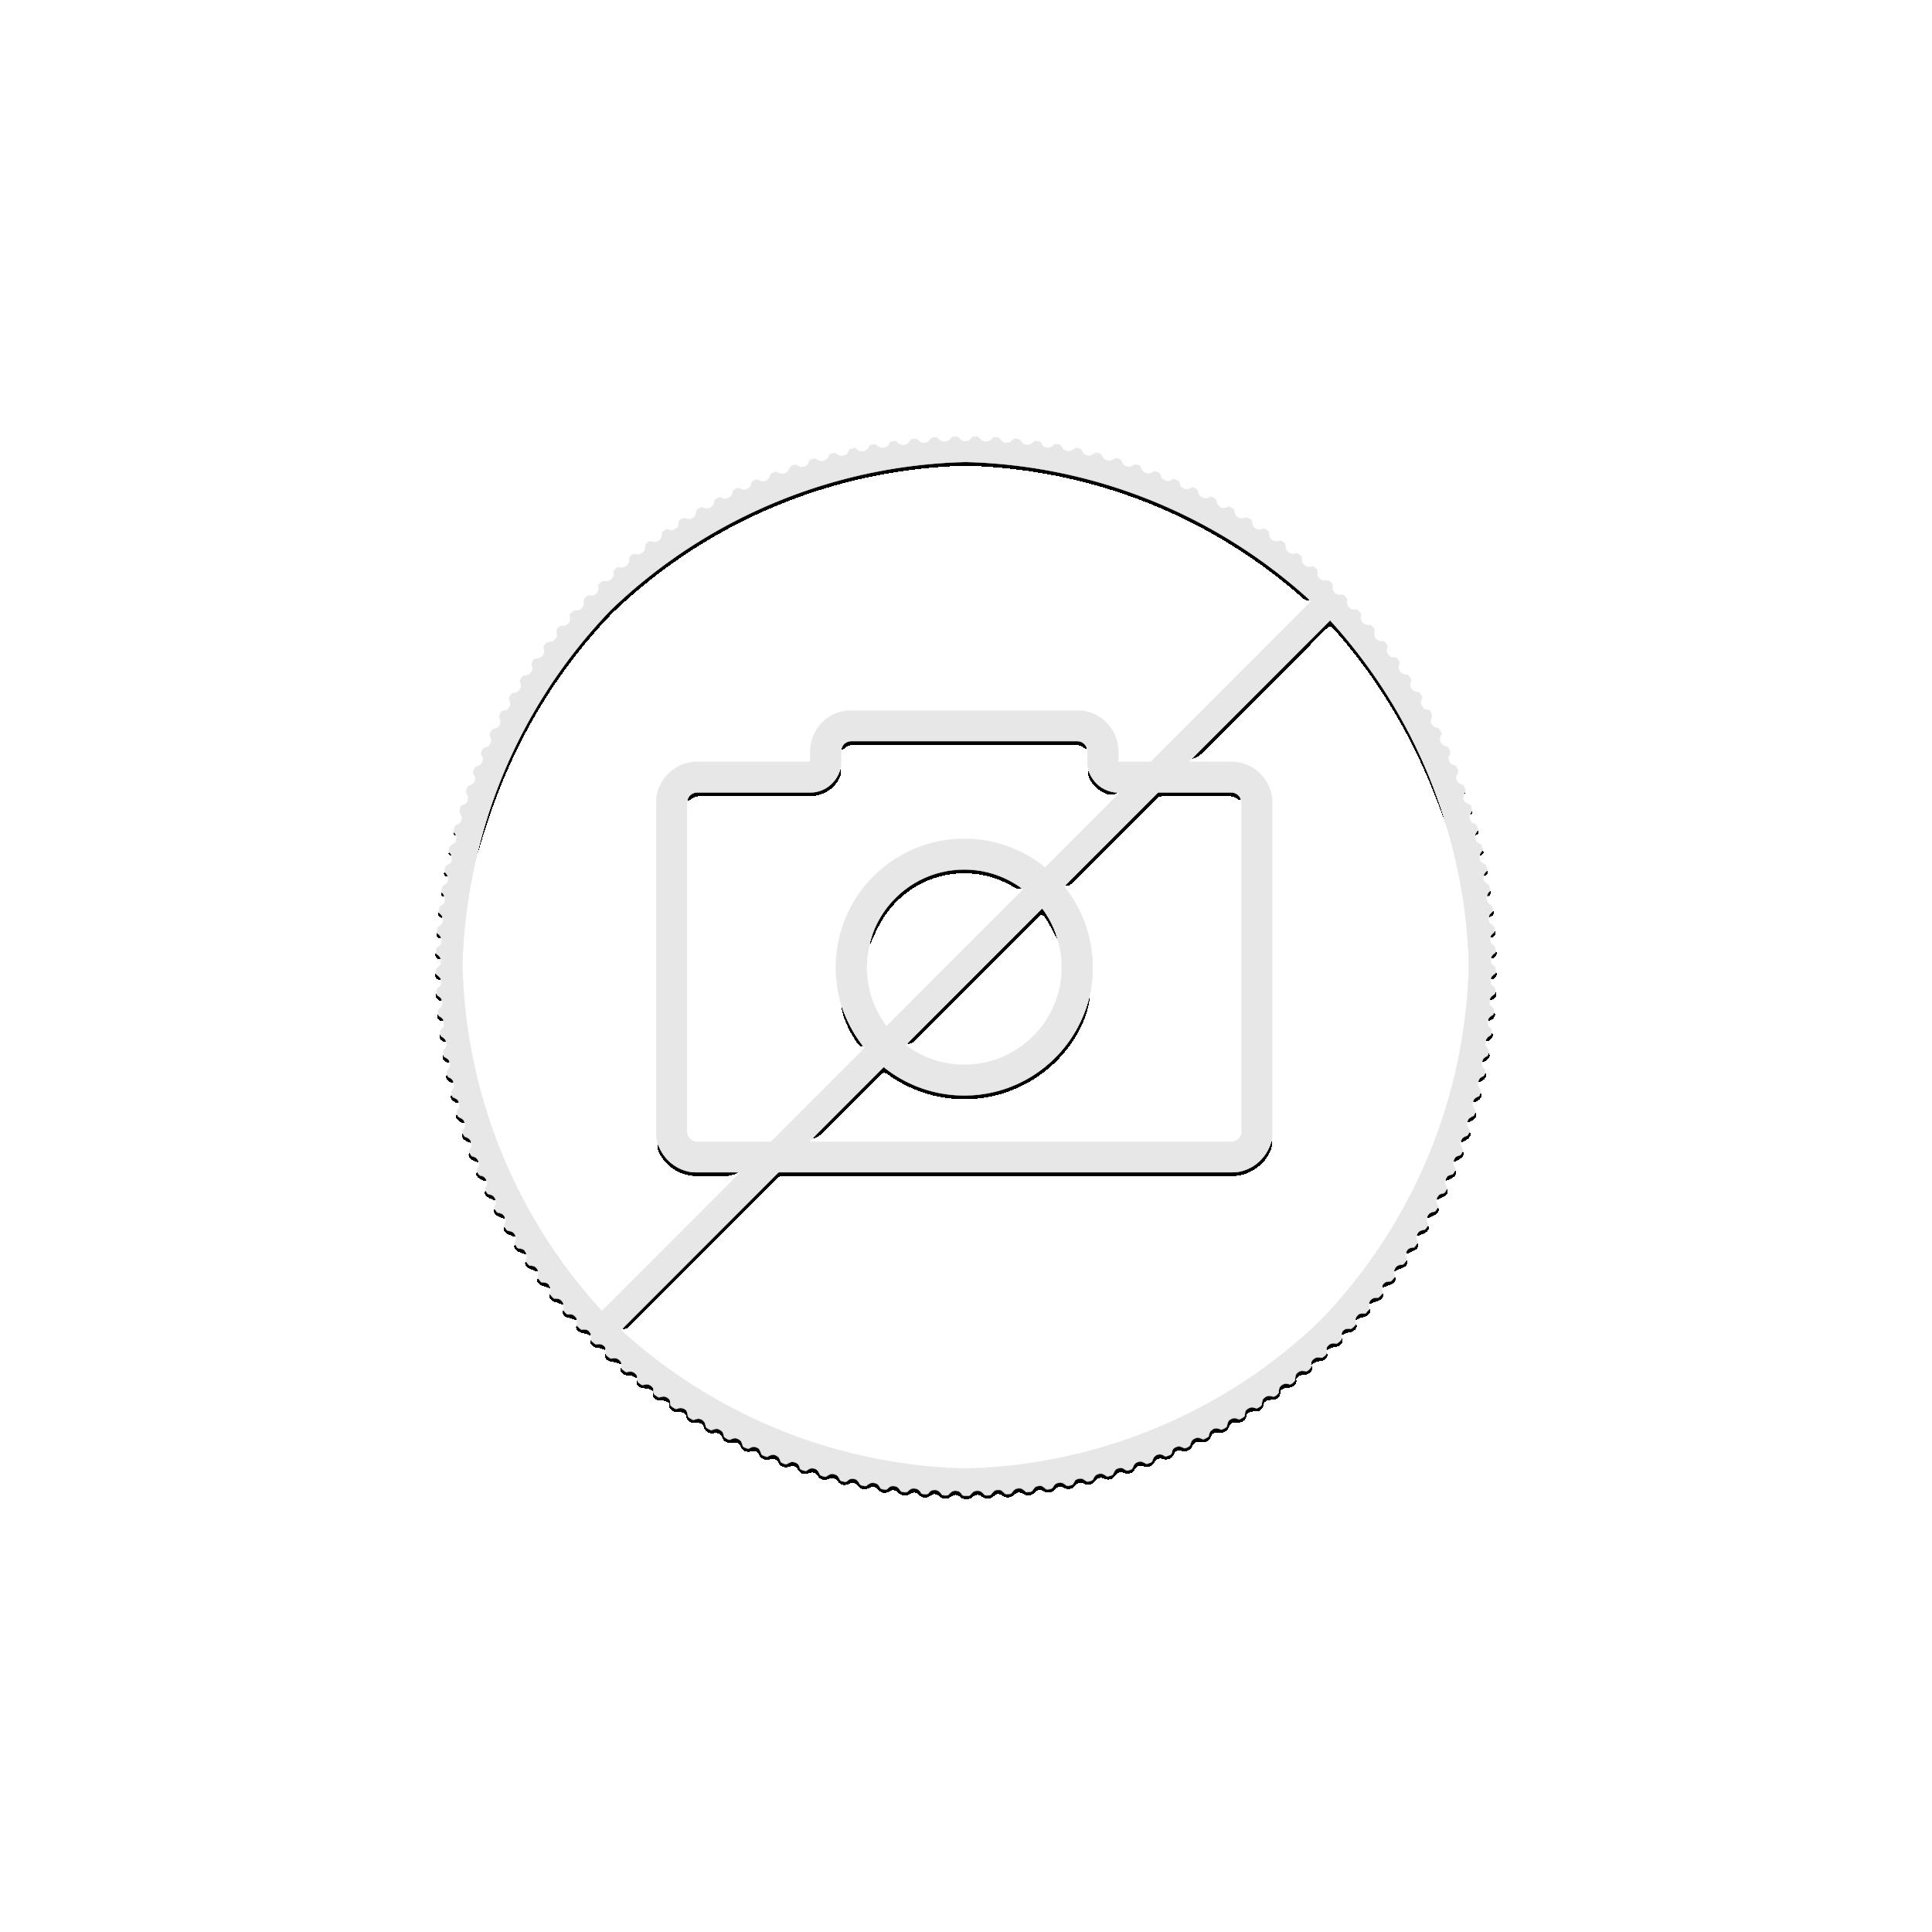 Argor Heraeus goudbaar 10 gram goud